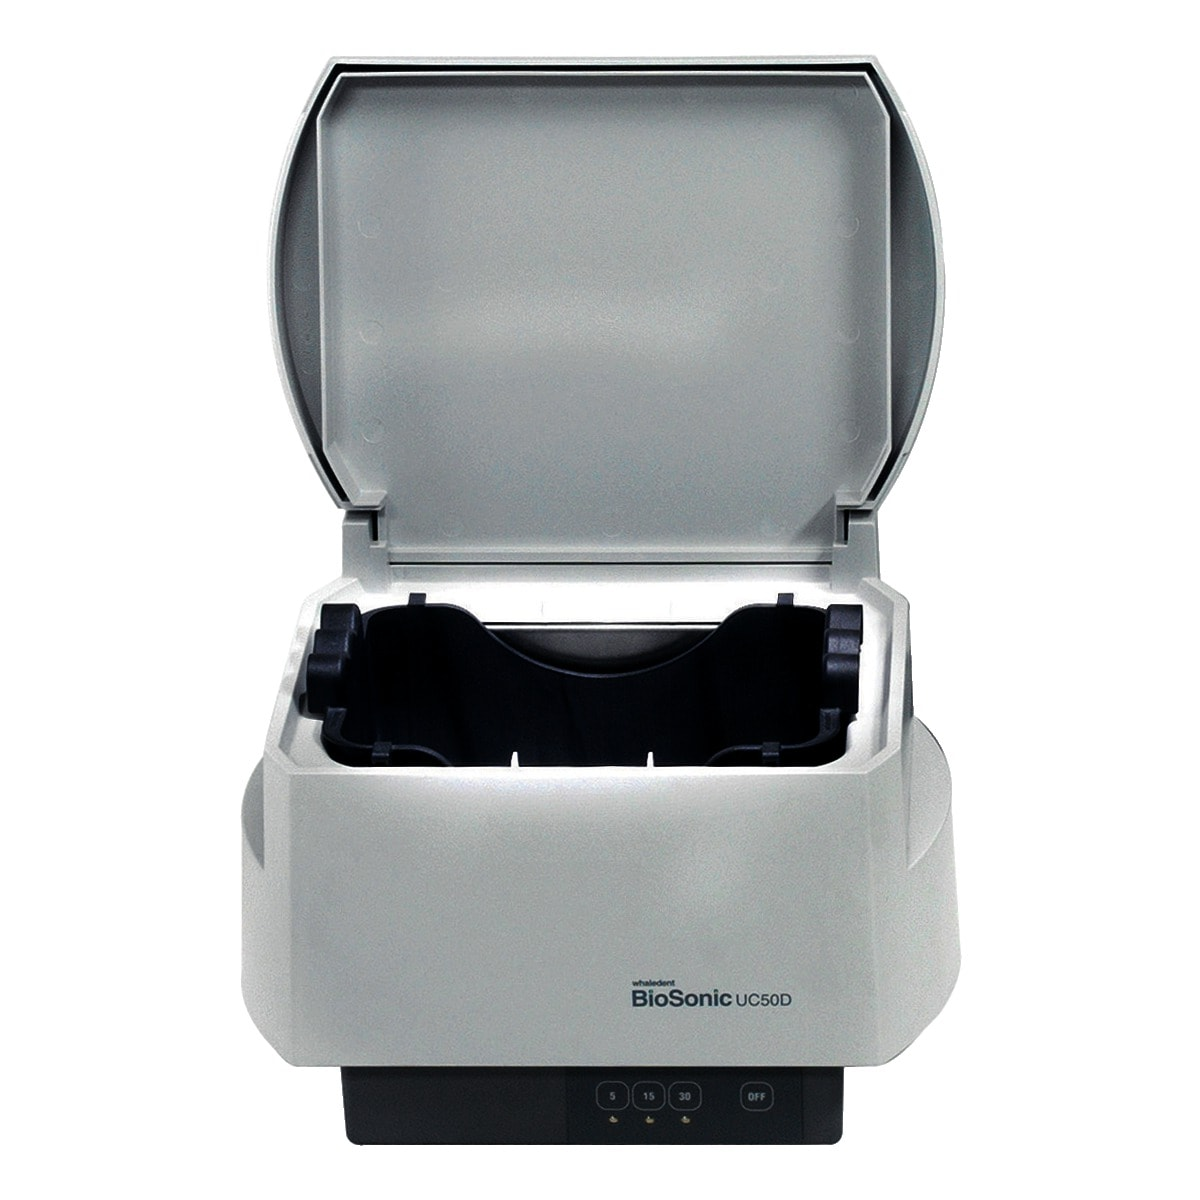 Biosonic UC50D Ultrasonic Cleaning System